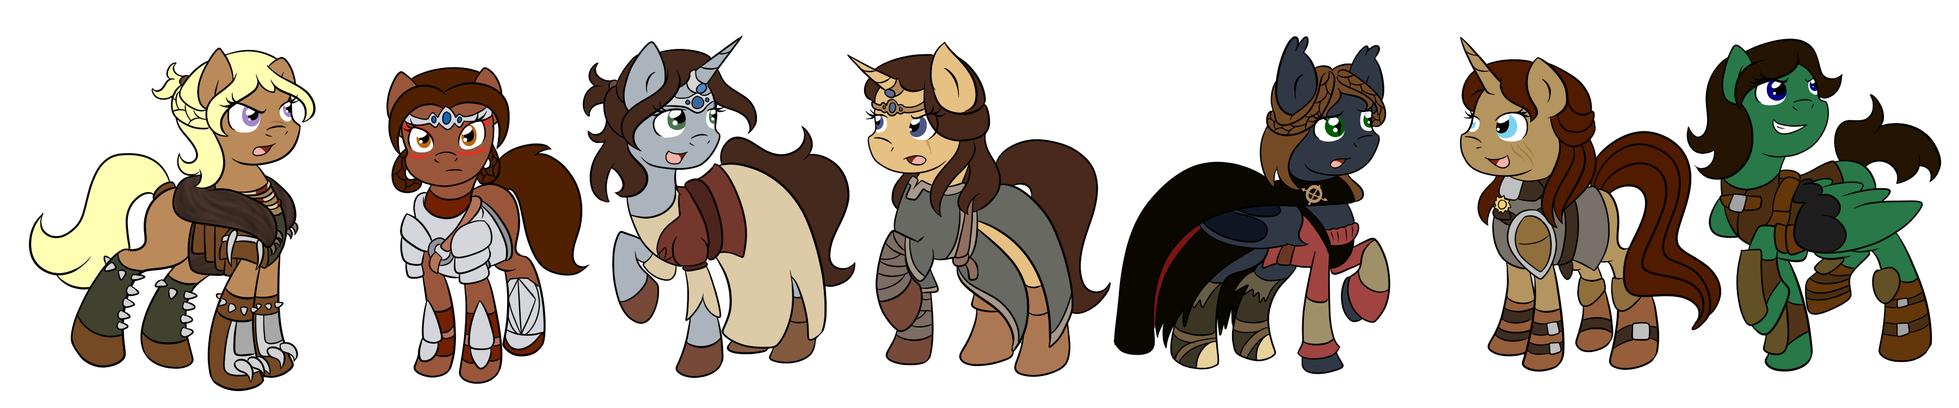 Skyrim Ponies by Fairiegirl101